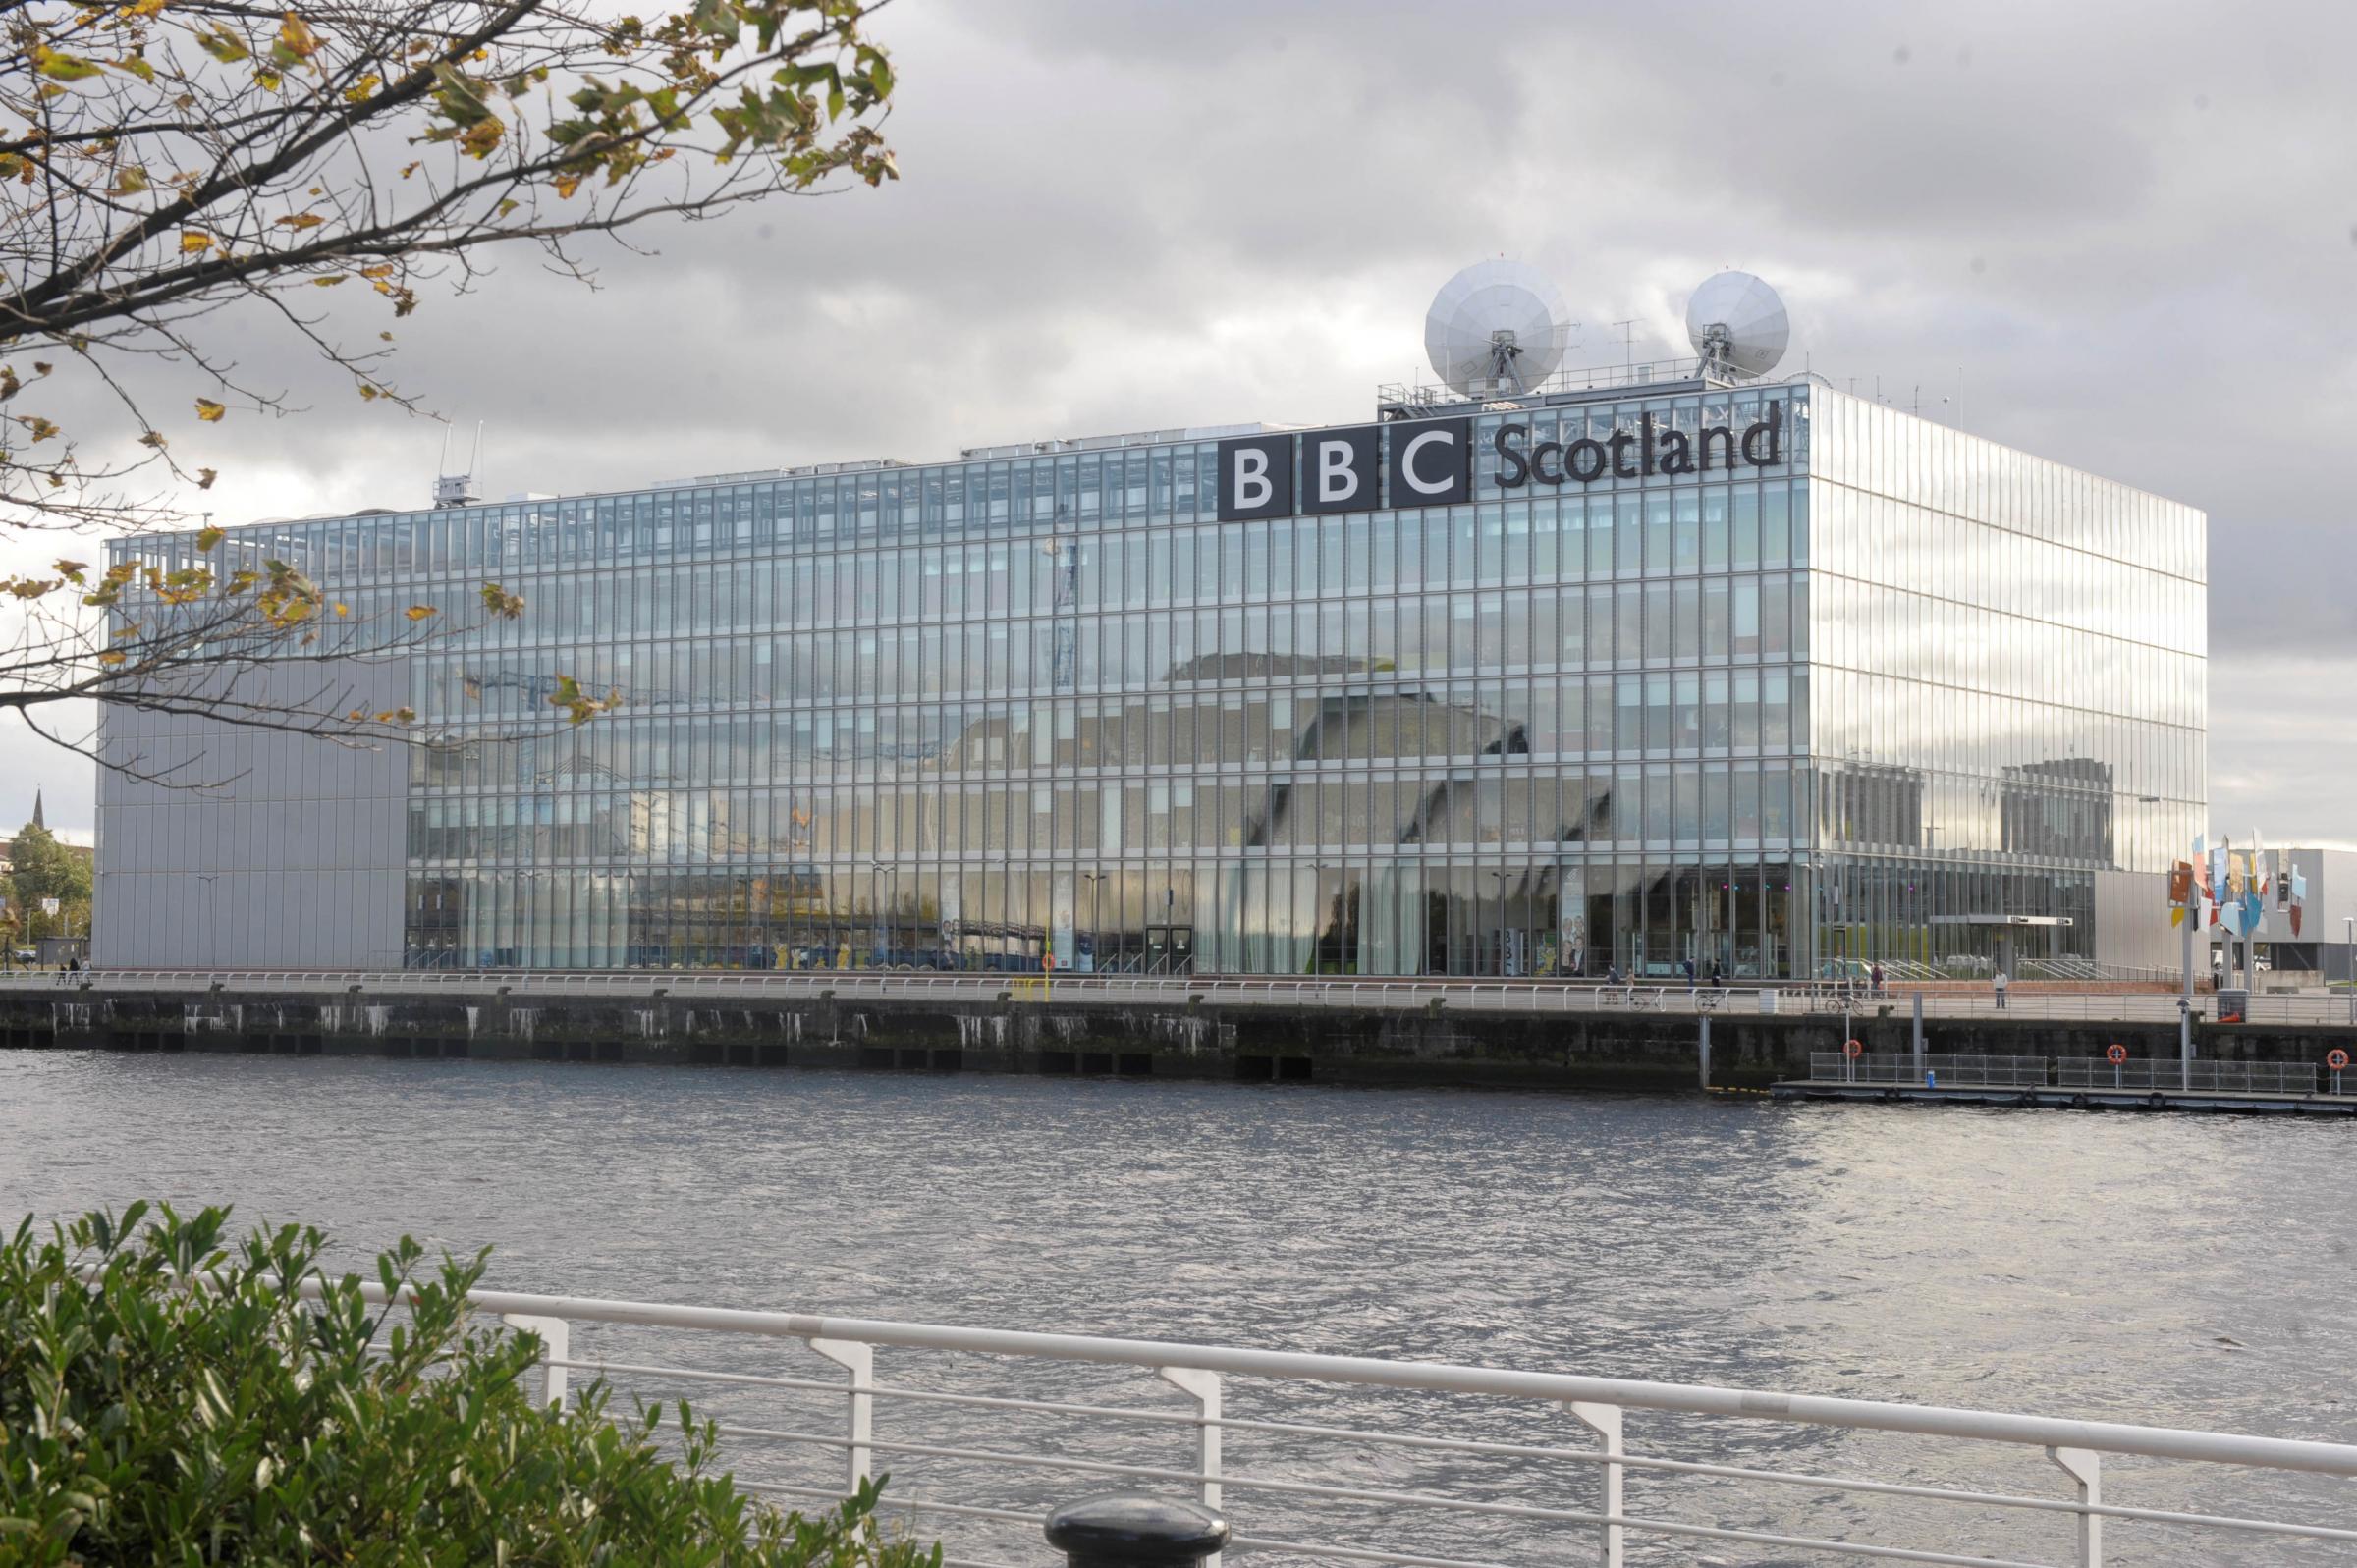 Loss of BBC Scotland bulletin 'concerning' during virus crisis, SNP warn